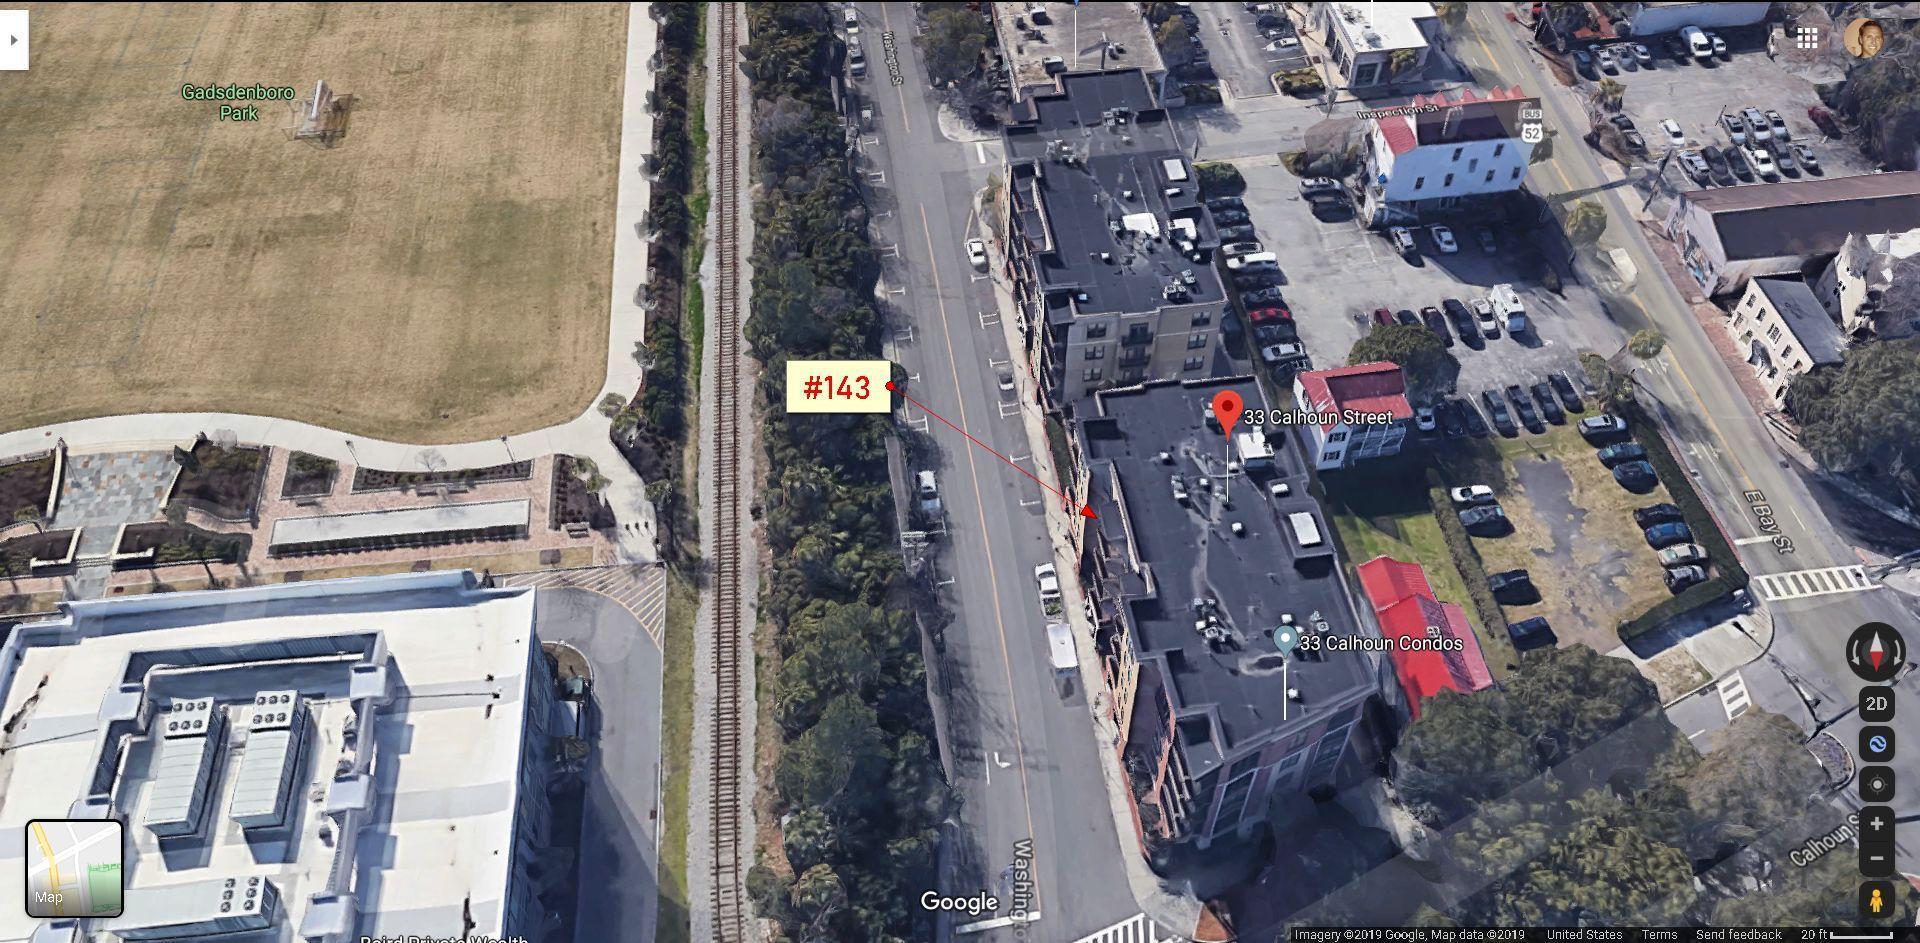 33 Calhoun Street UNIT 143-Bld Charleston, SC 29401